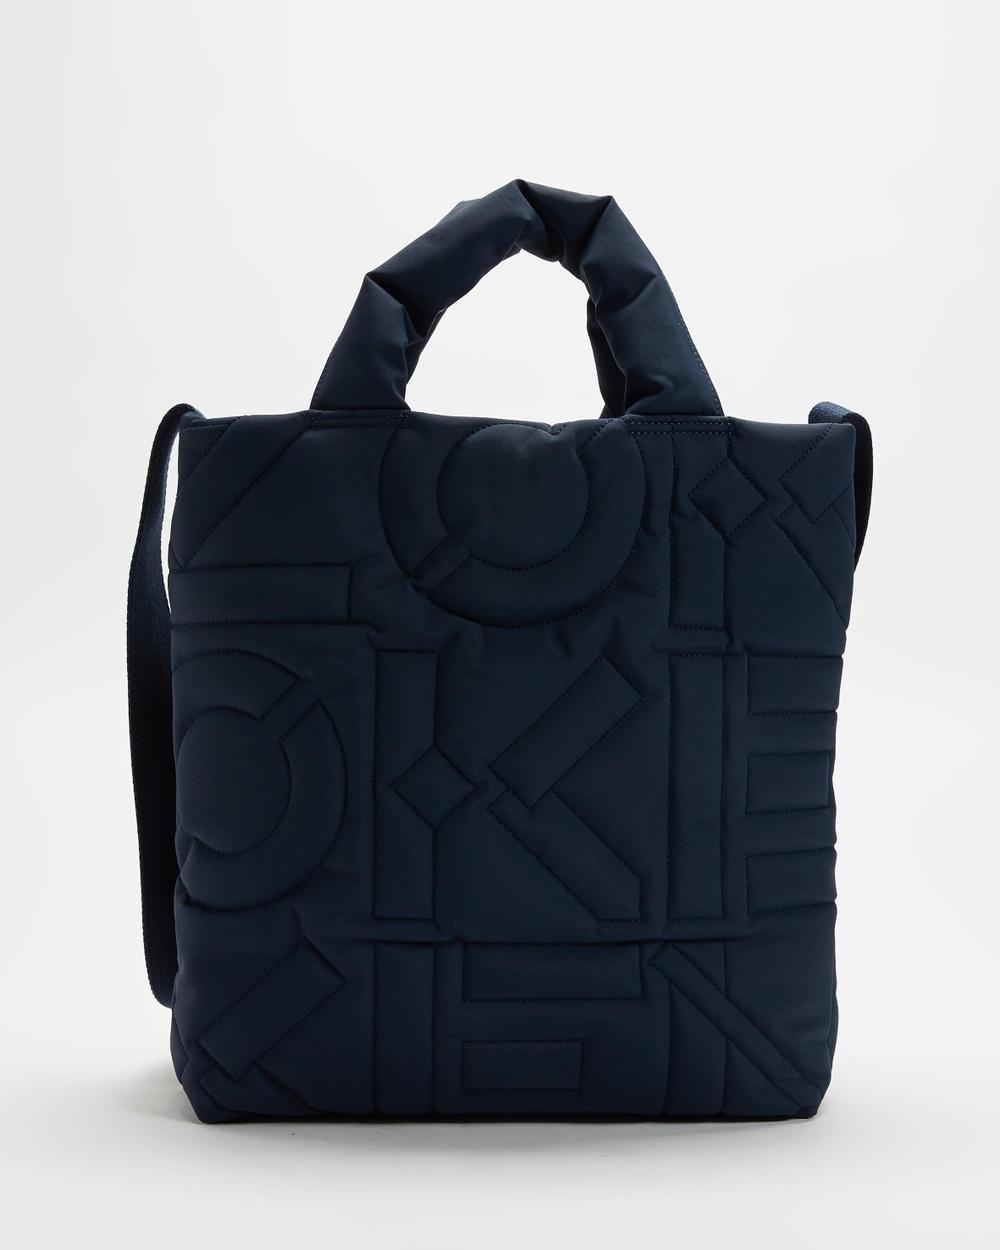 Kenzo Arctic Tote Bag Bags Navy Blue